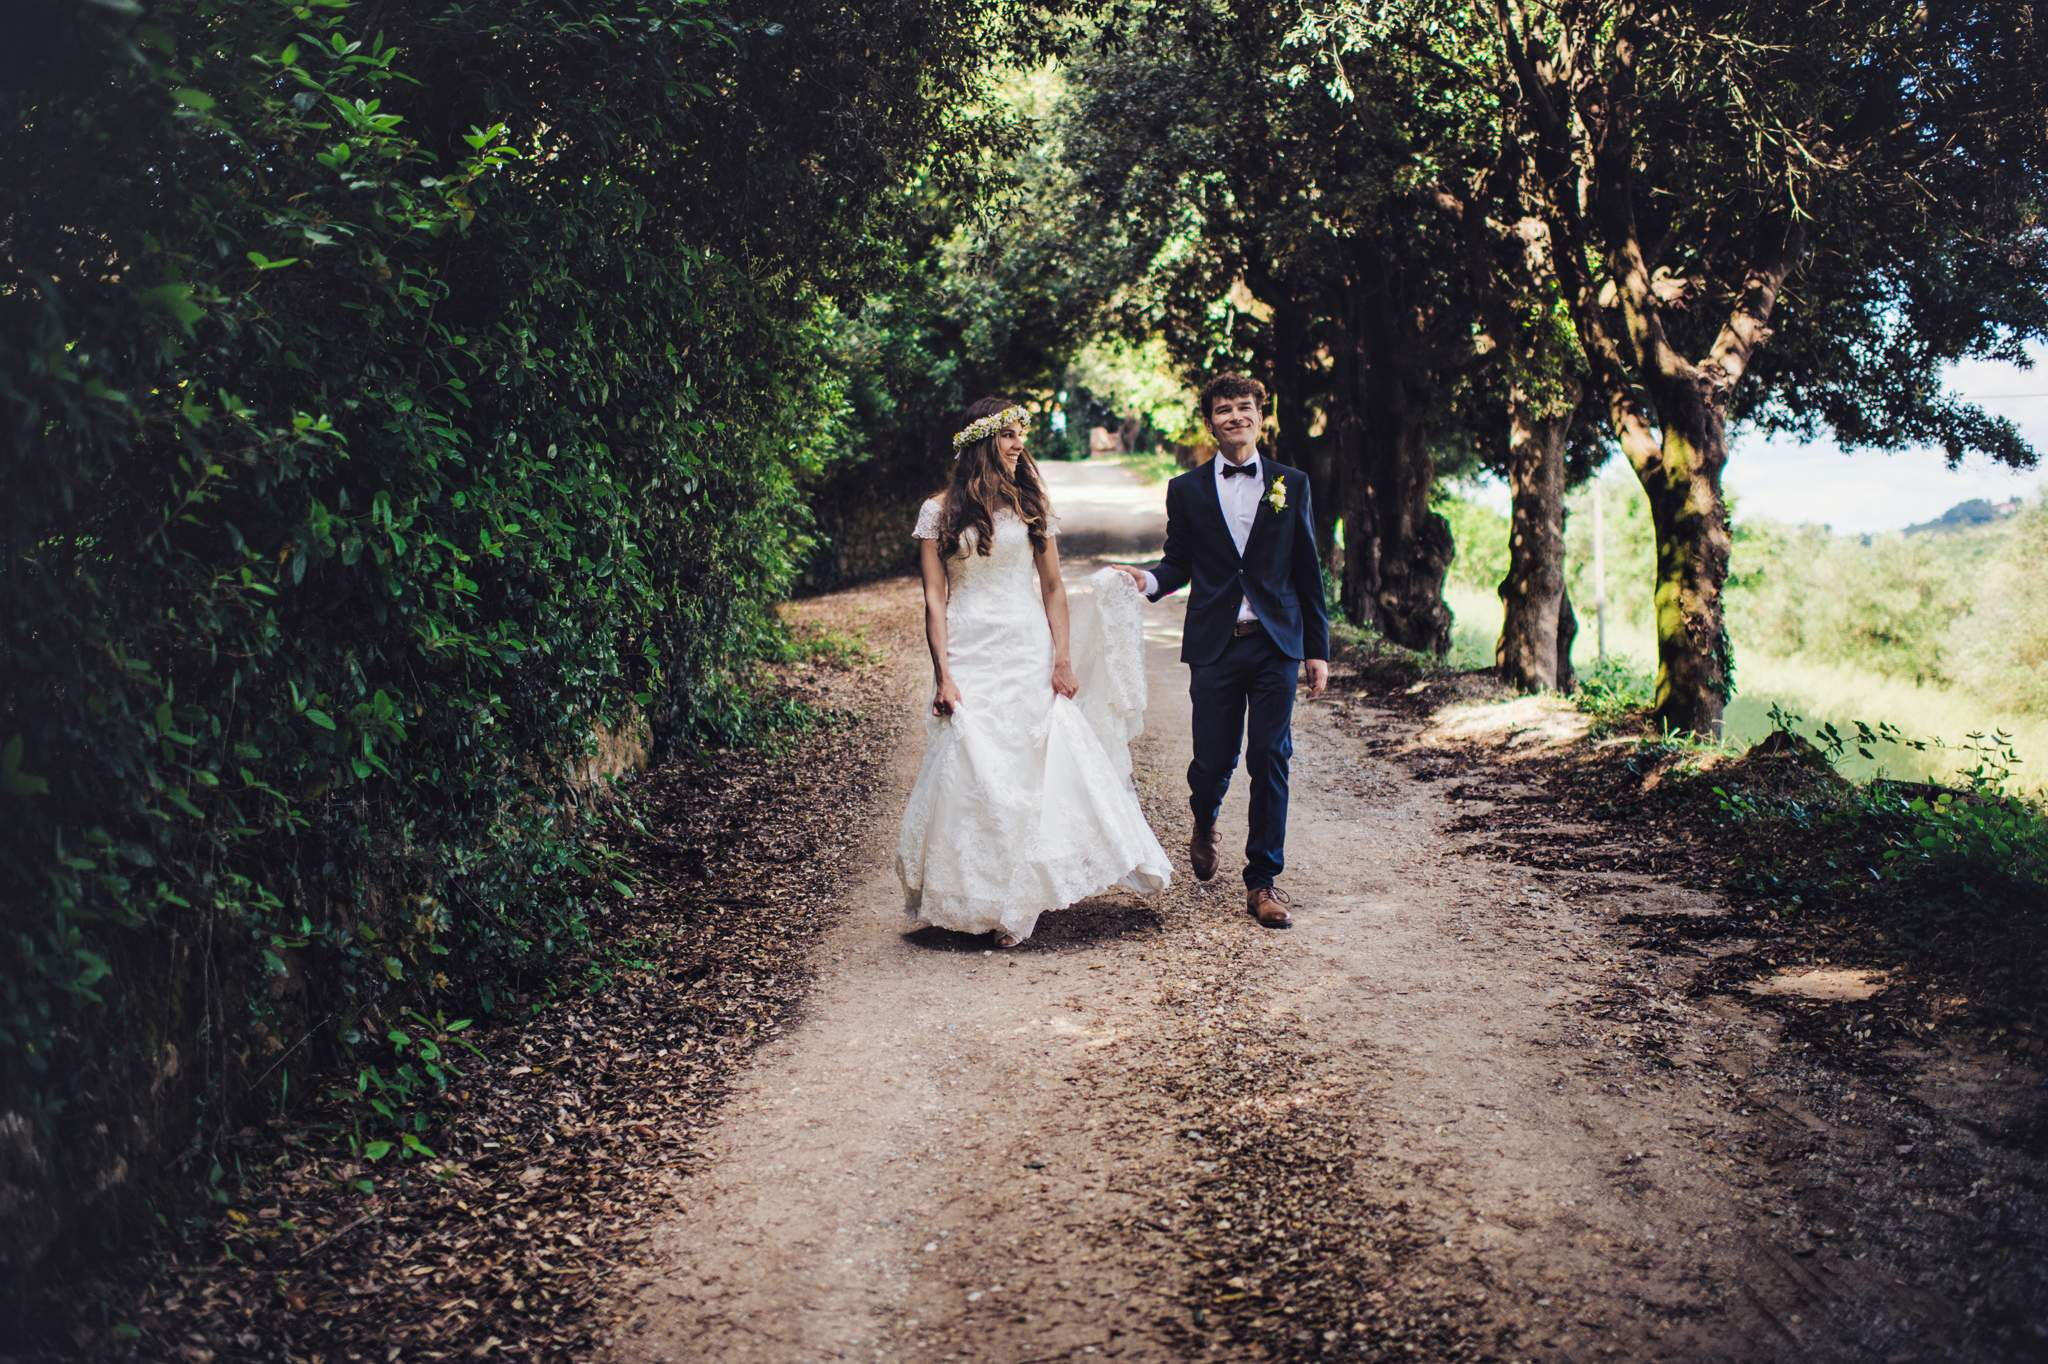 32wedding-photographer-tuscany-siena